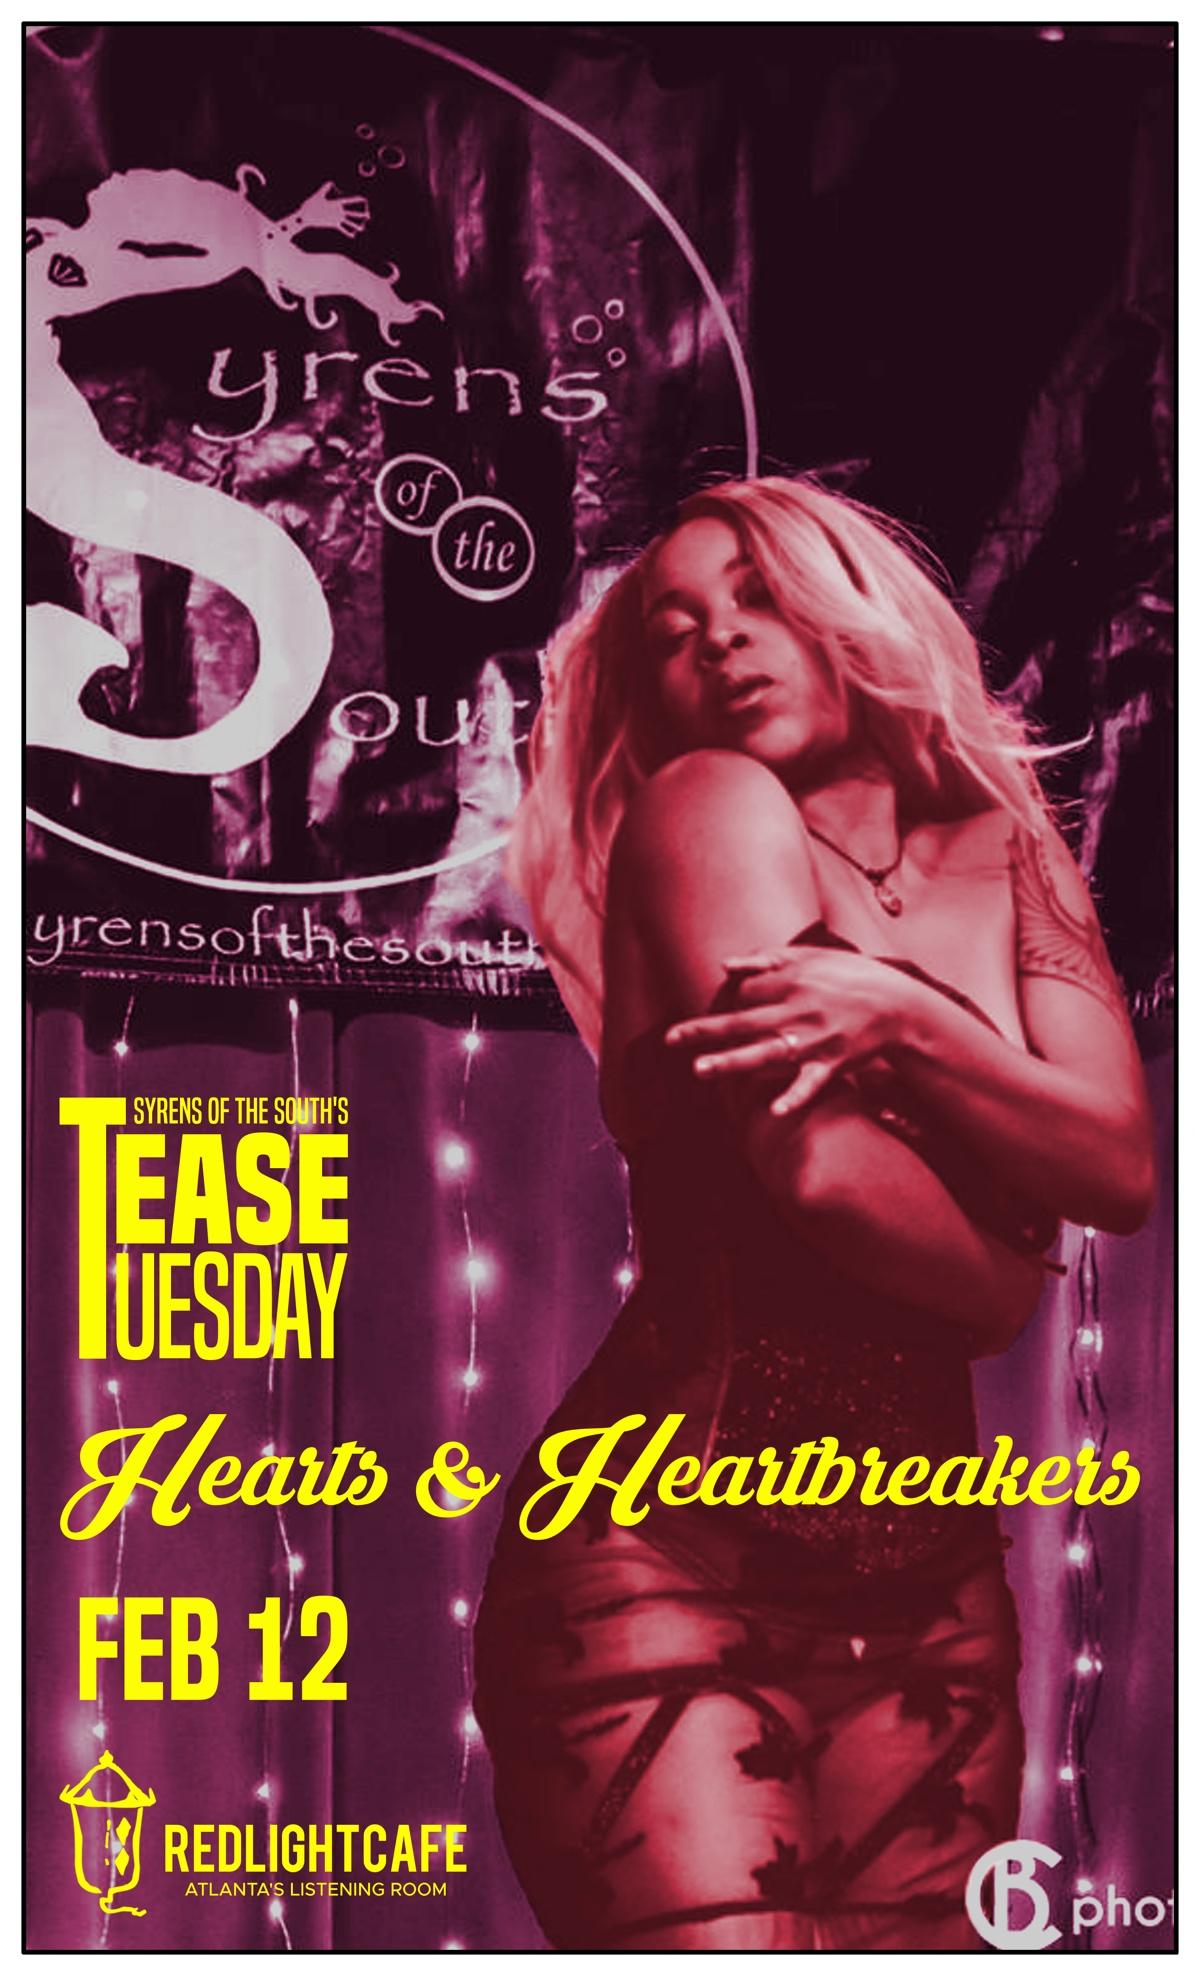 Tease Tuesday Burlesque: Hearts & Heartbreakers — February 12, 2019 — Red Light Café, Atlanta, GA